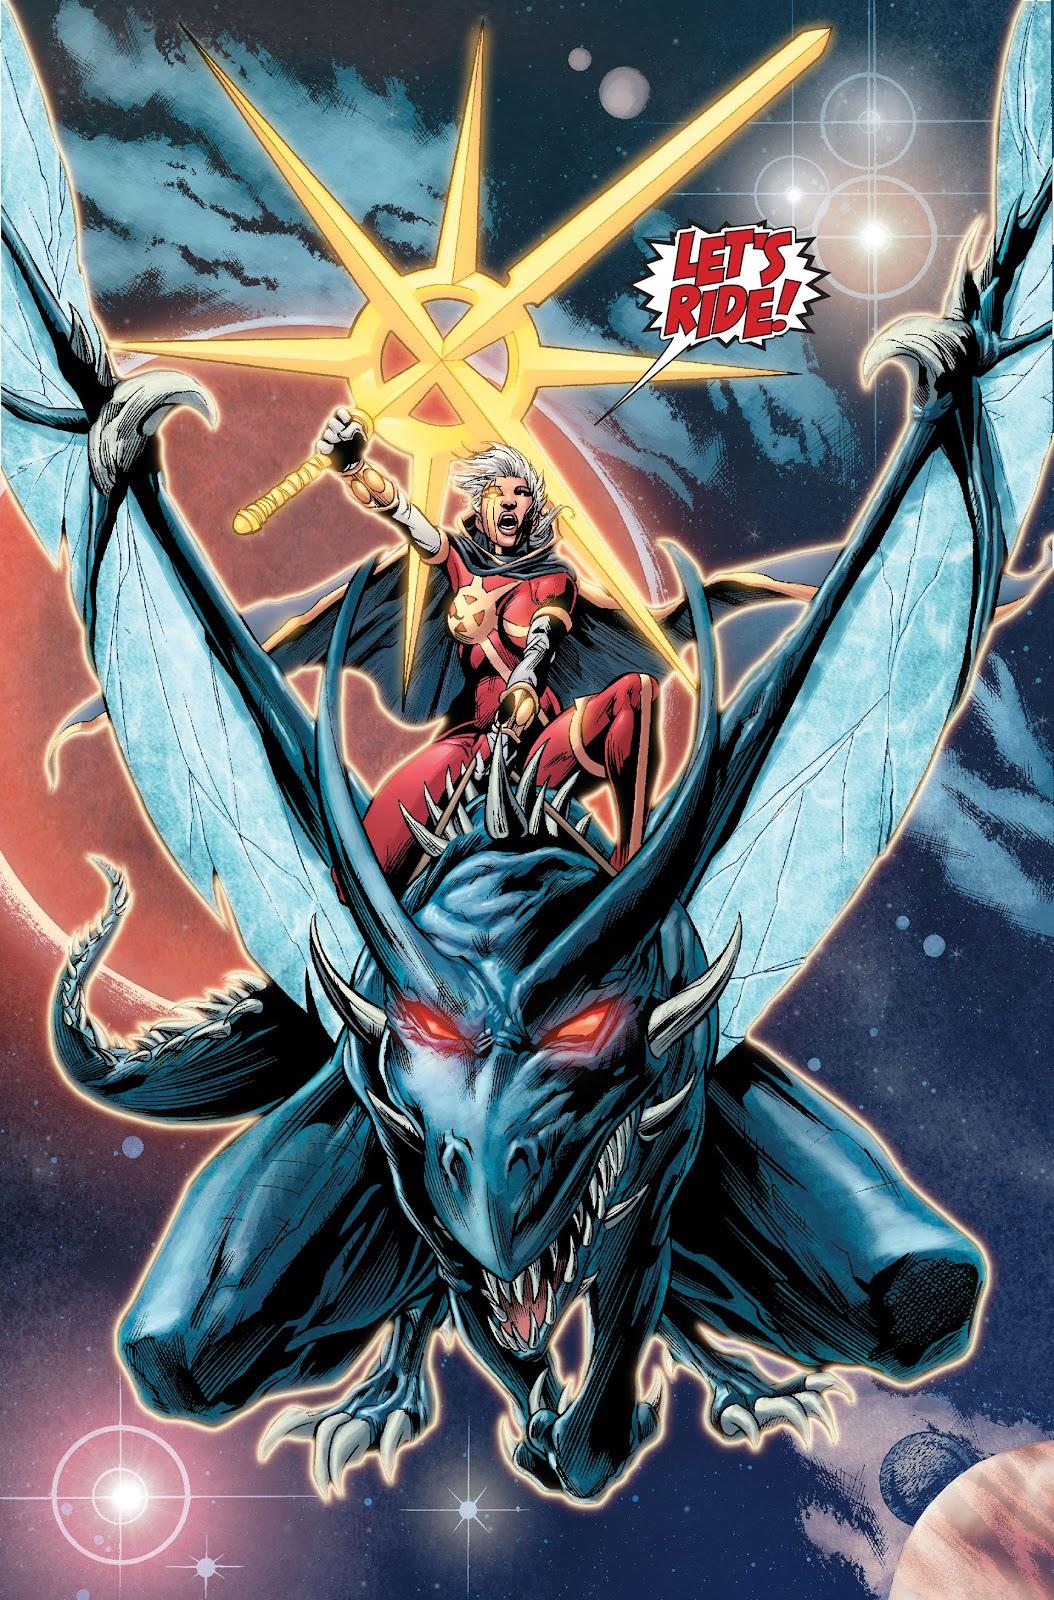 Annihilation: Conquest - Quasar issue 3 - Page 7